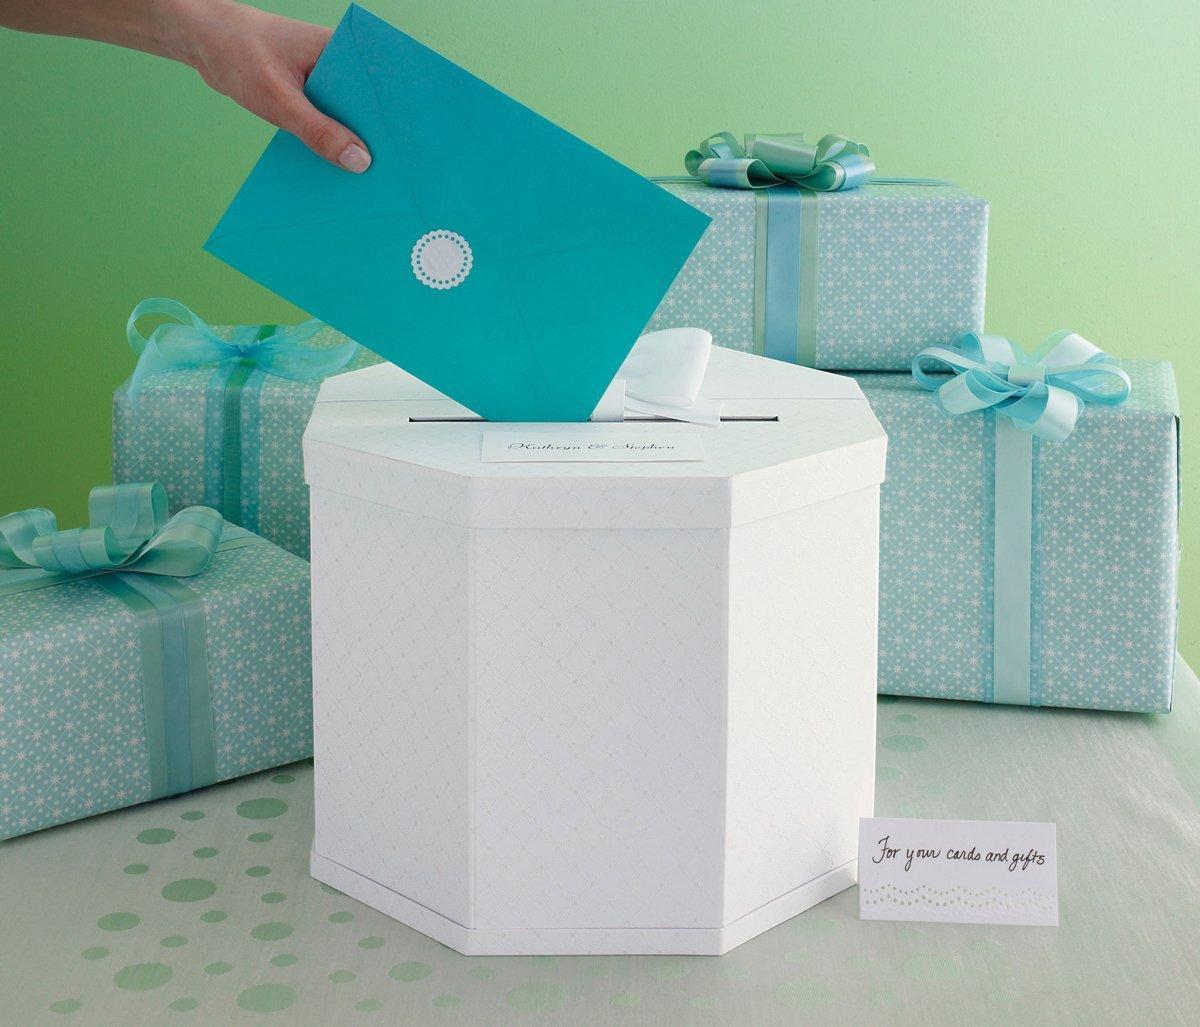 Wedding Gift Card Box Money Reception Holder Party Wishing Birthday Hotel Event & Wedding Gift Card Box Money Reception Holder Wishing Birthday ... Aboutintivar.Com